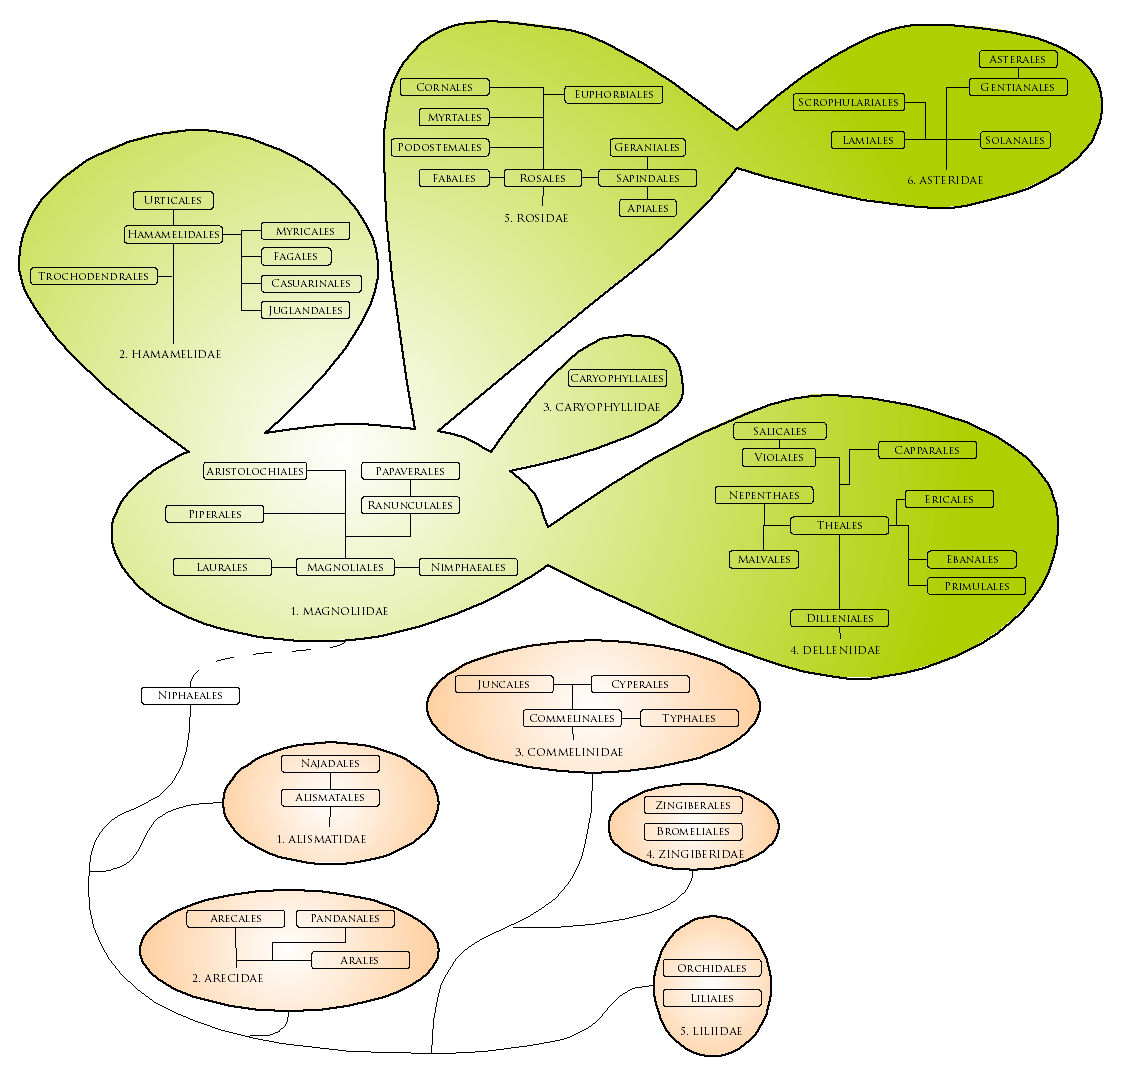 File:Evoluzione Magnoliophyta.png - Wikimedia Commons